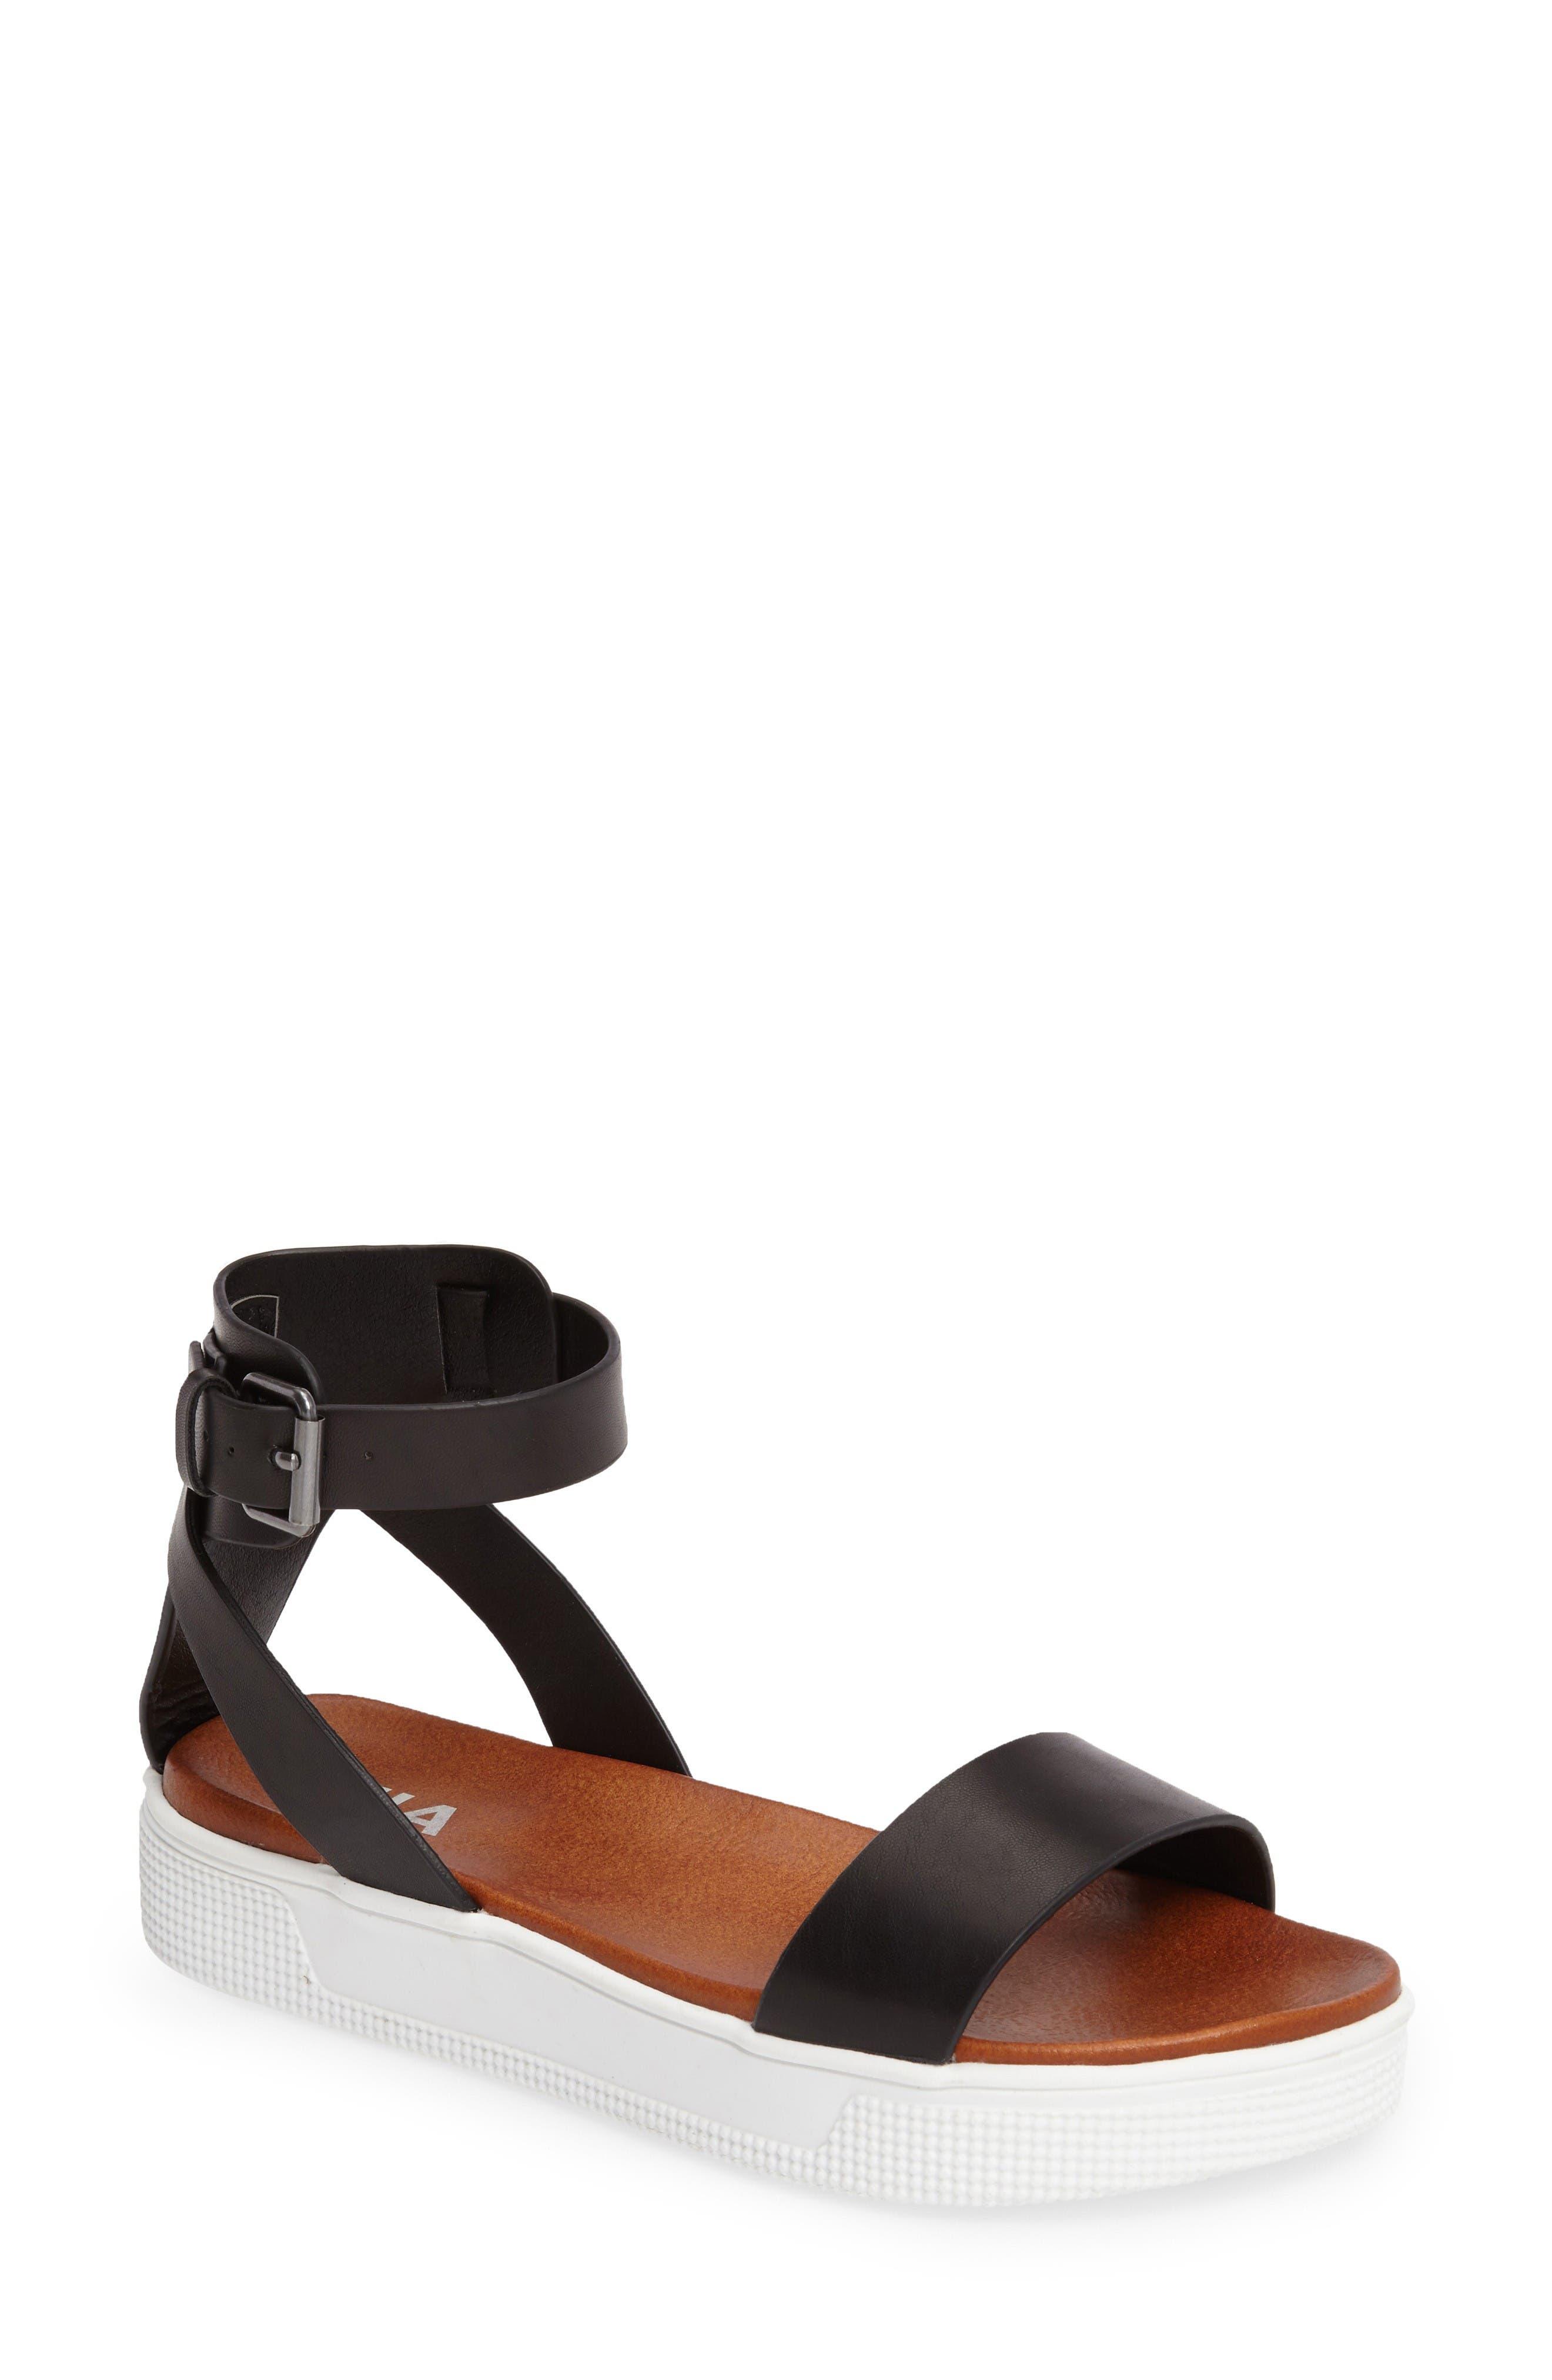 Main Image - MIA Platform Sandal (Women)